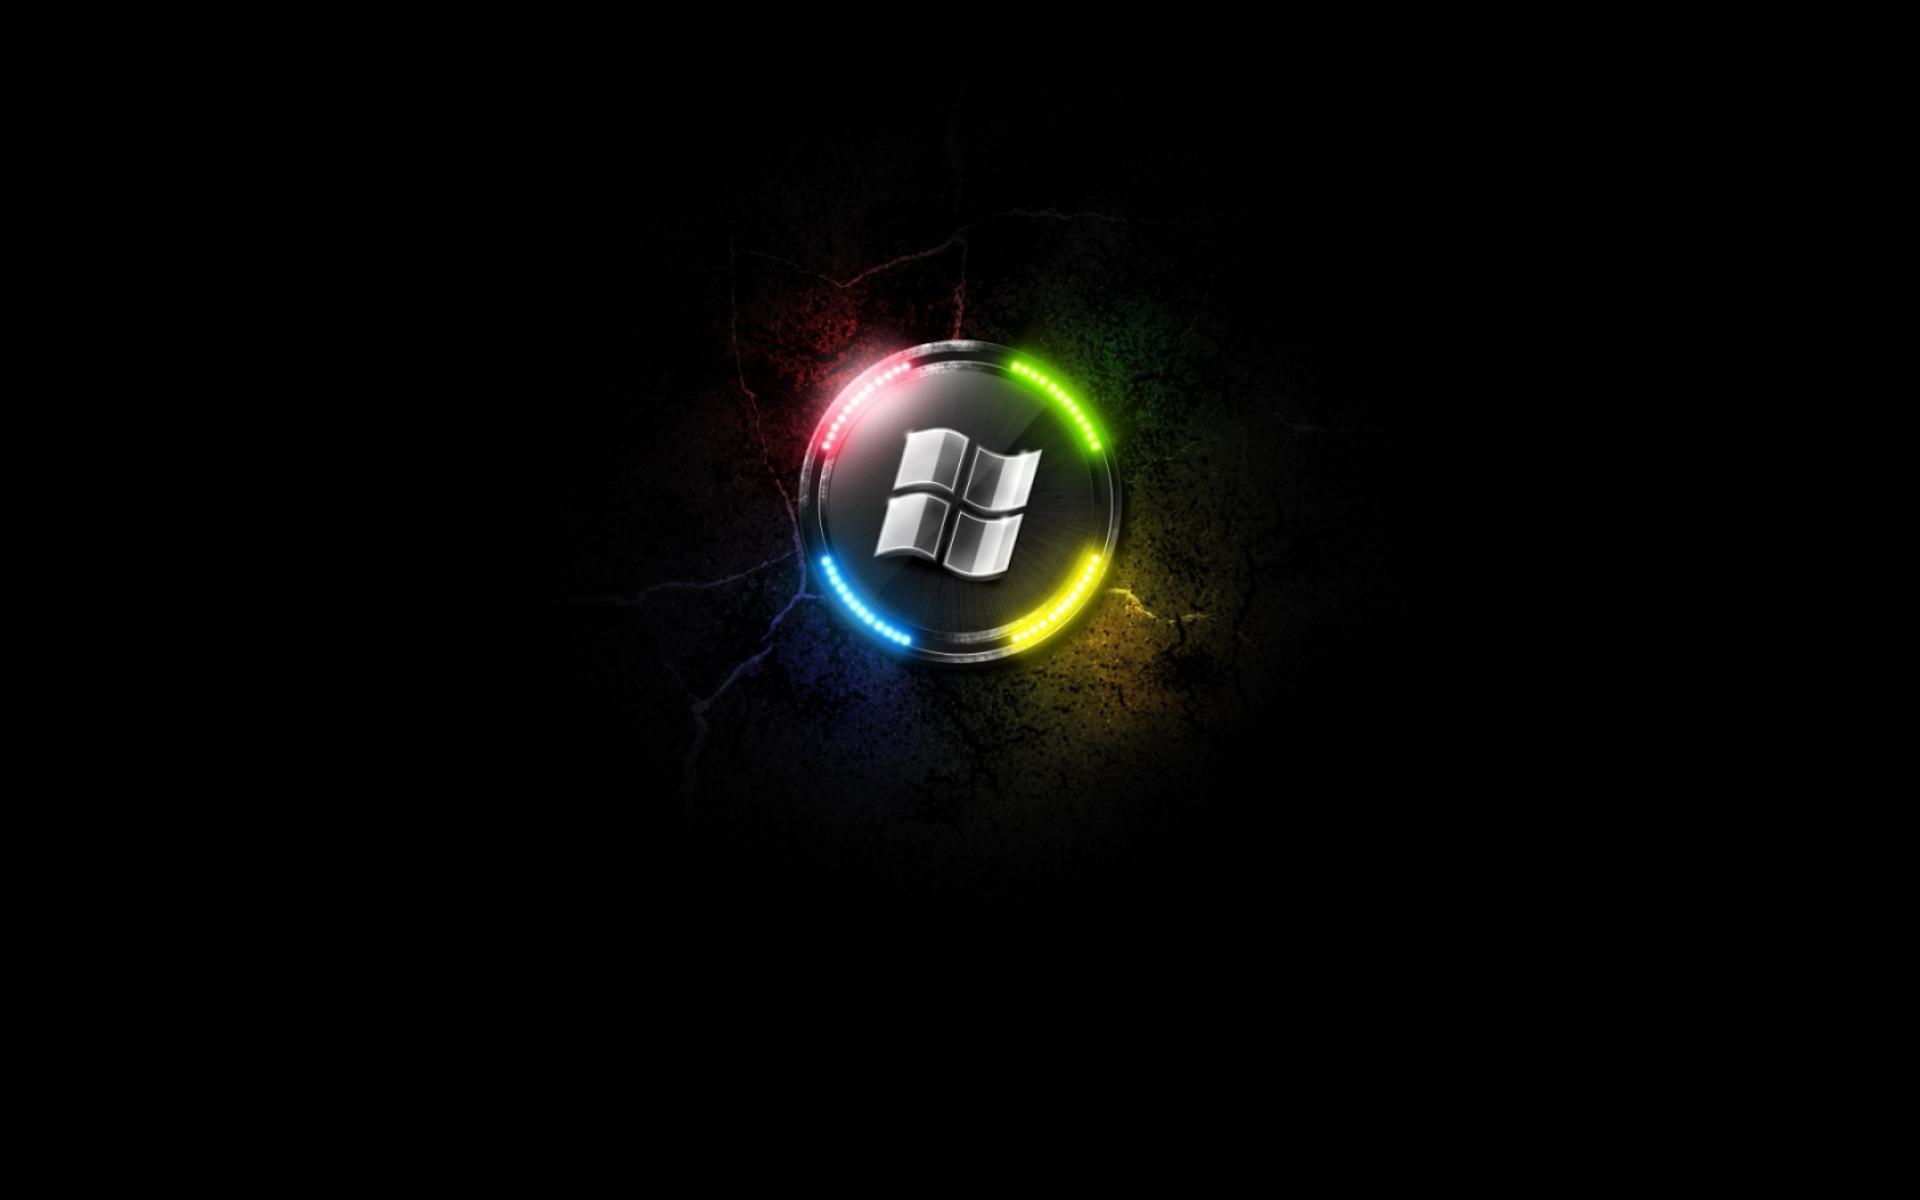 Windows 7 Lights 1440x900.